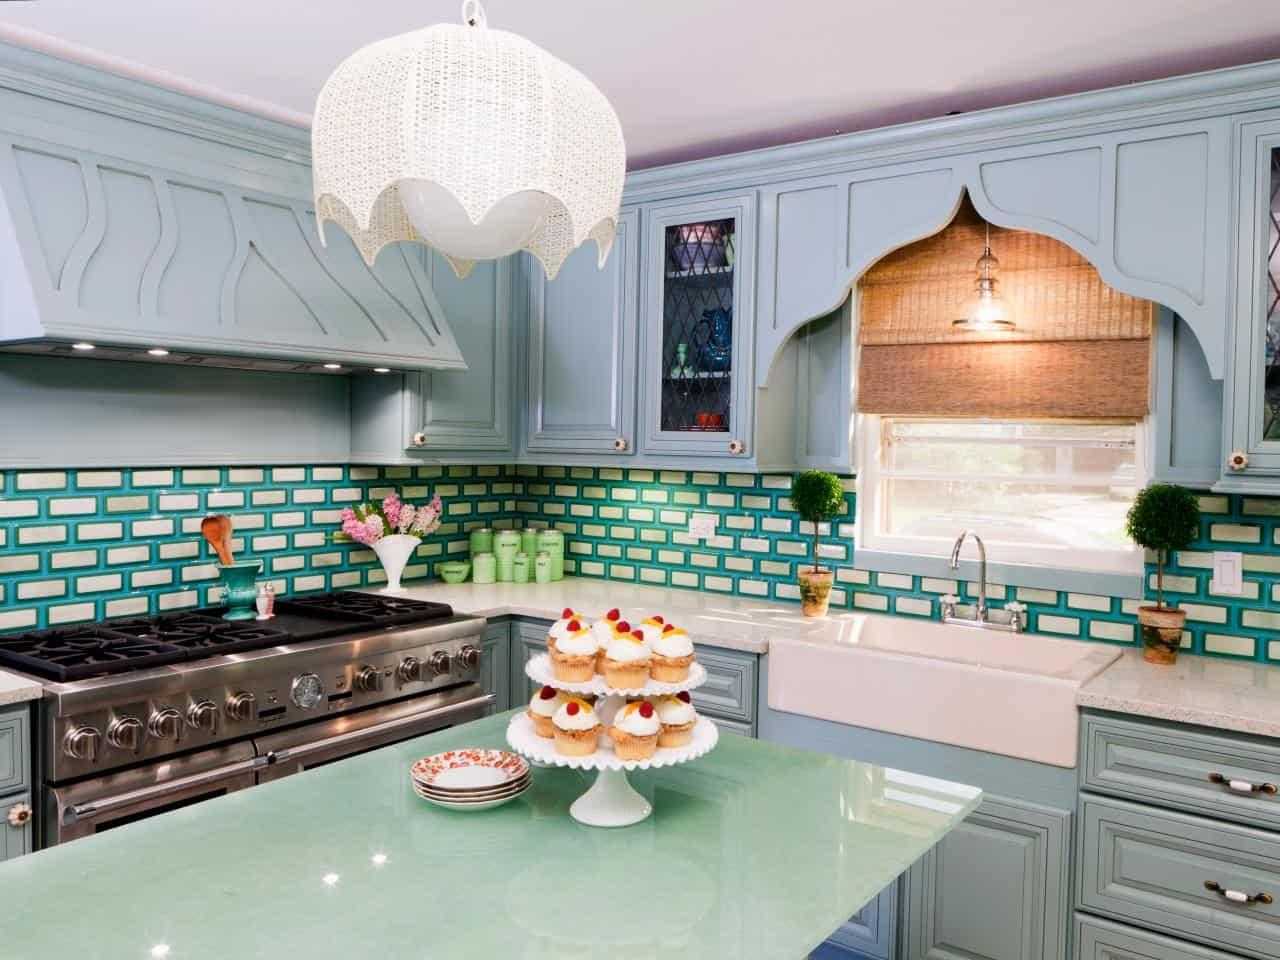 Colorful kitchen backplash tiles